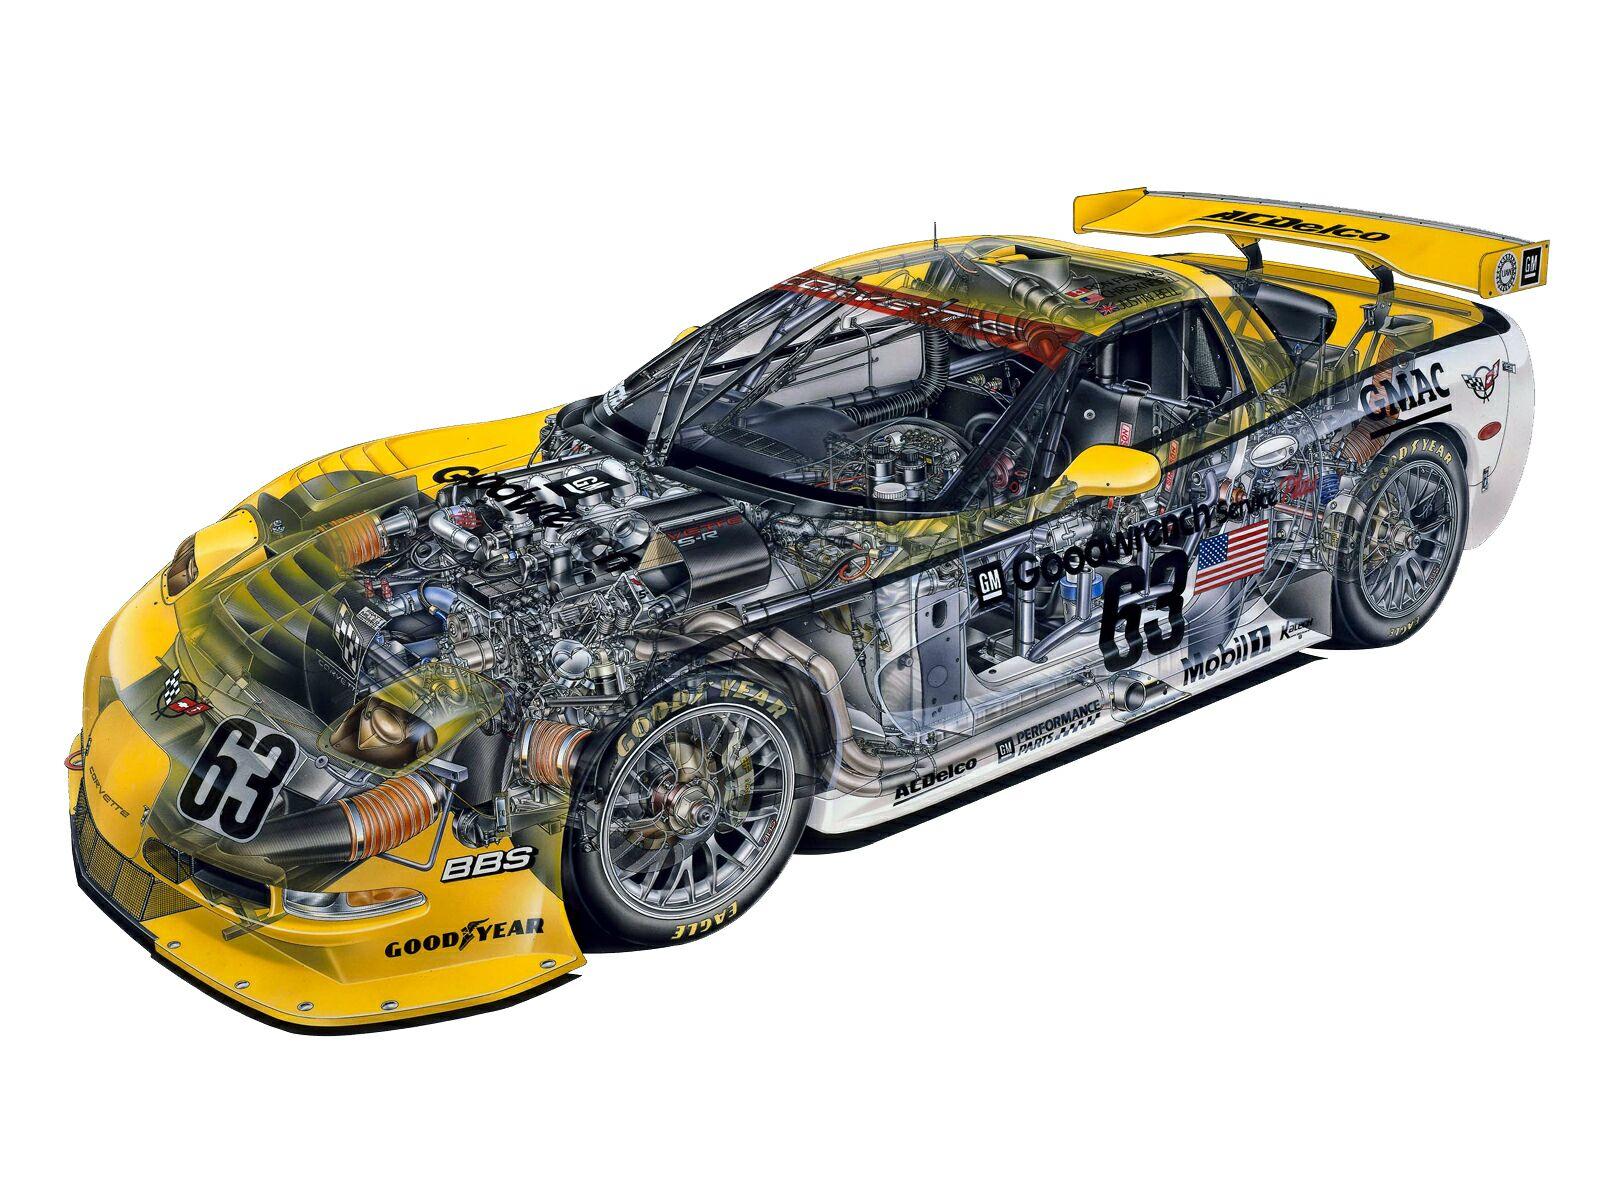 Race car wallpaper Its My Car Club 1600x1200